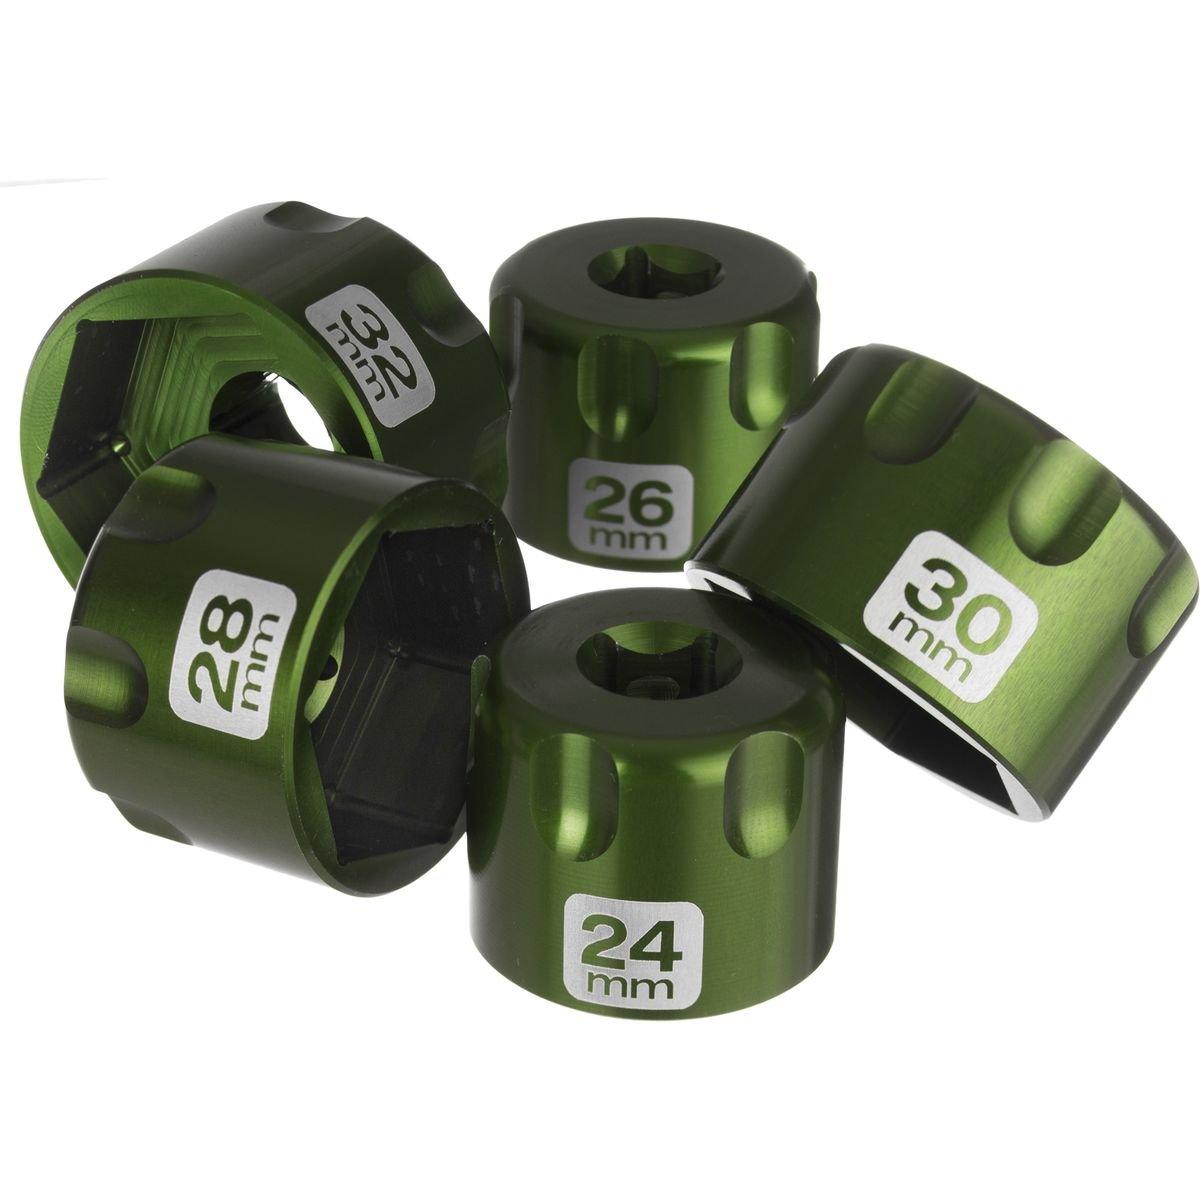 Abbey Bike Tools Suspension Top Cap Socket Set Green, Set of 5, 24 to 32mm